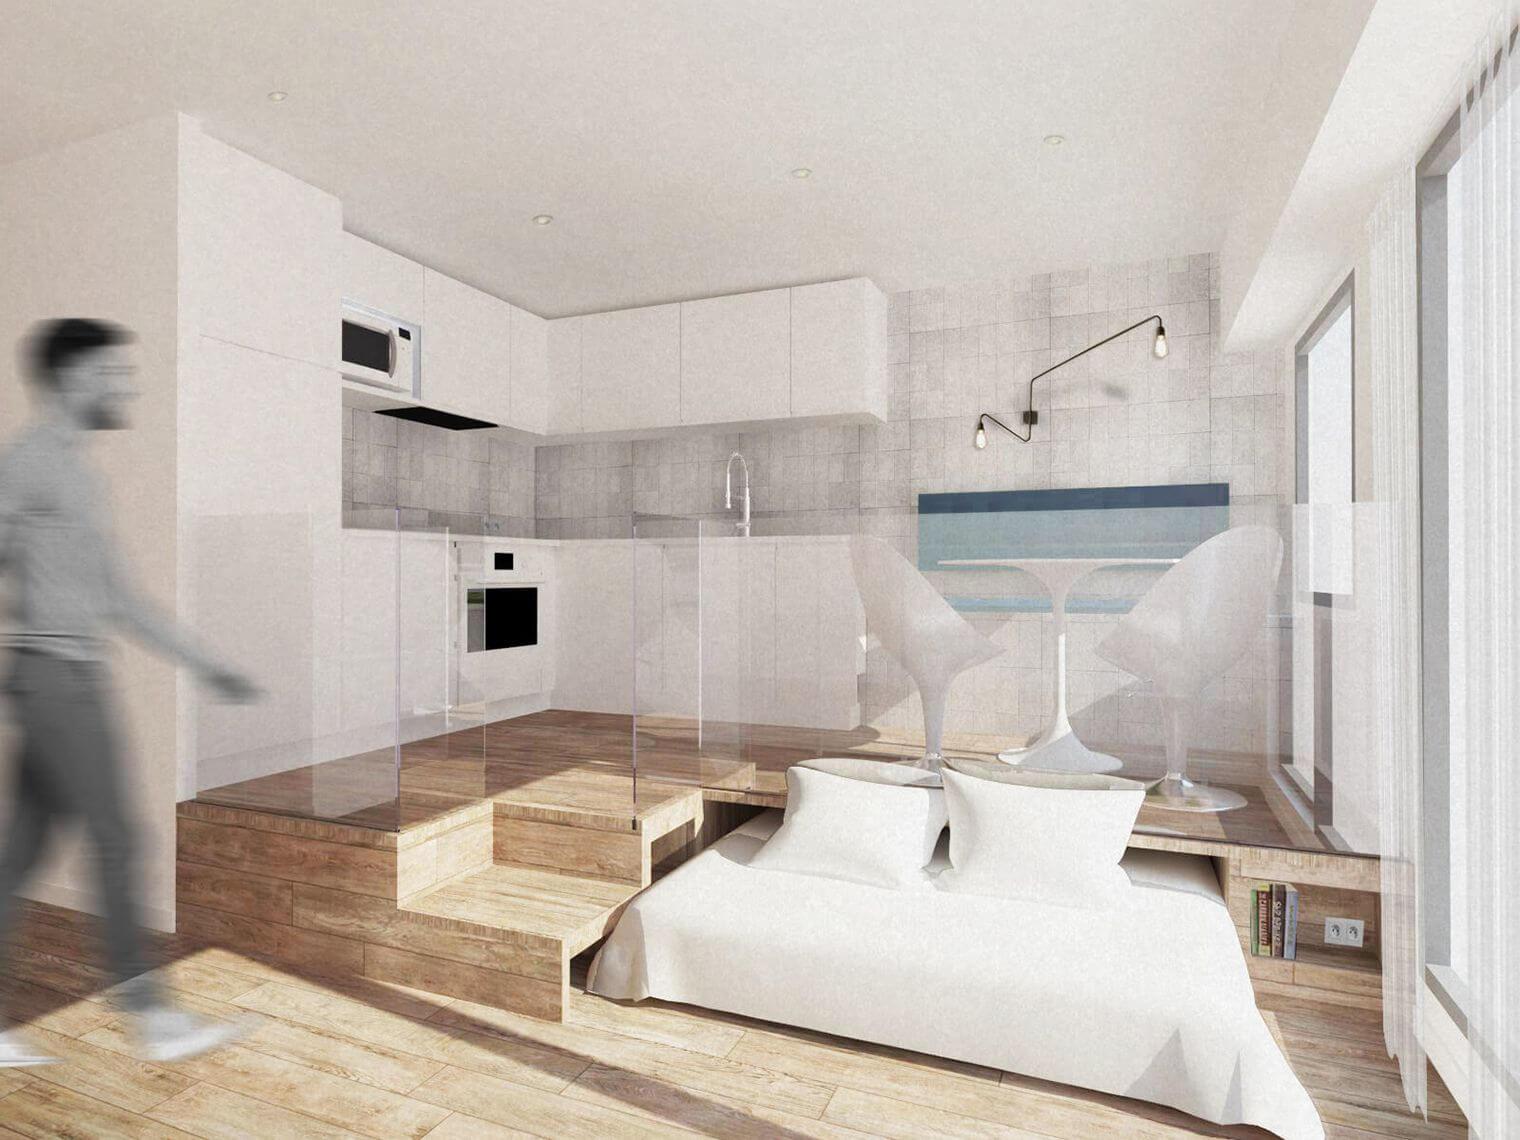 Renovation studio - plan 3D